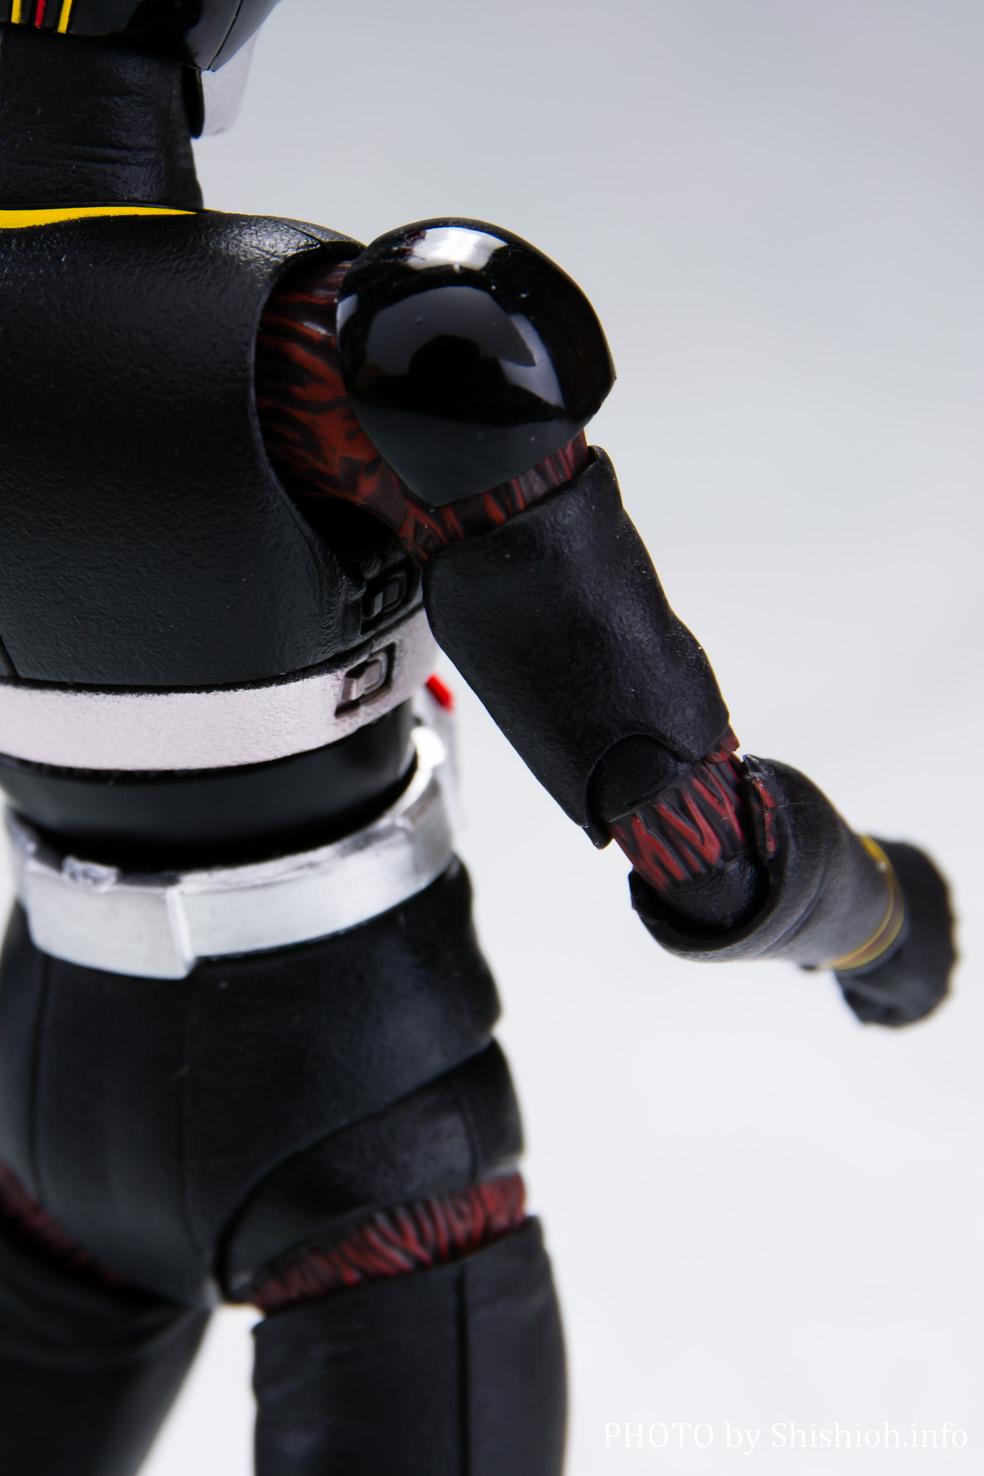 S.H.Figuarts (真骨彫製法) 仮面ライダーBLACK